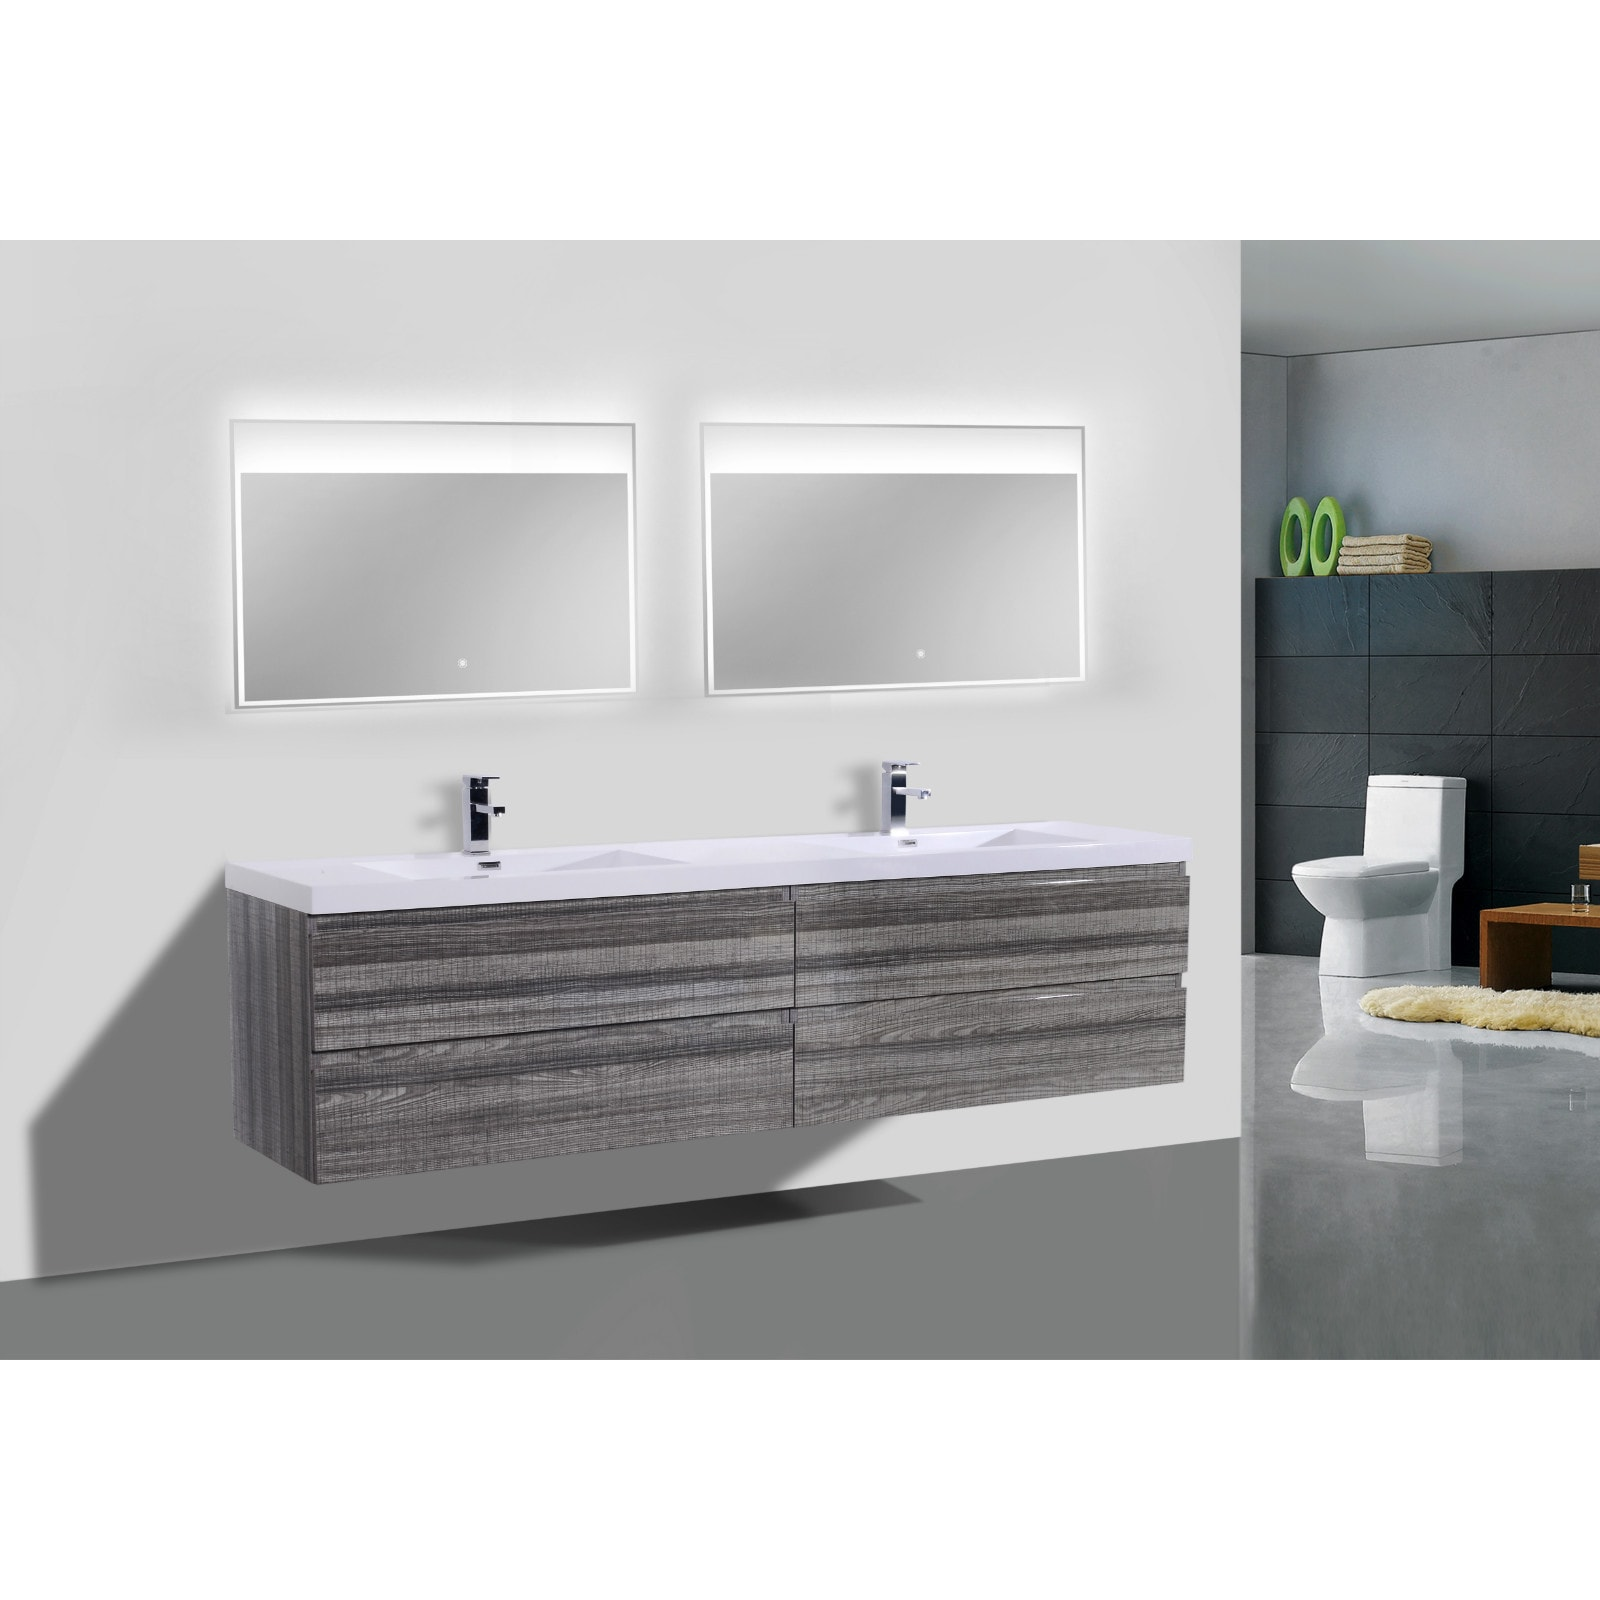 Moreno MOB 72-inch Double Sink Wall Mounted Modern Bathro...